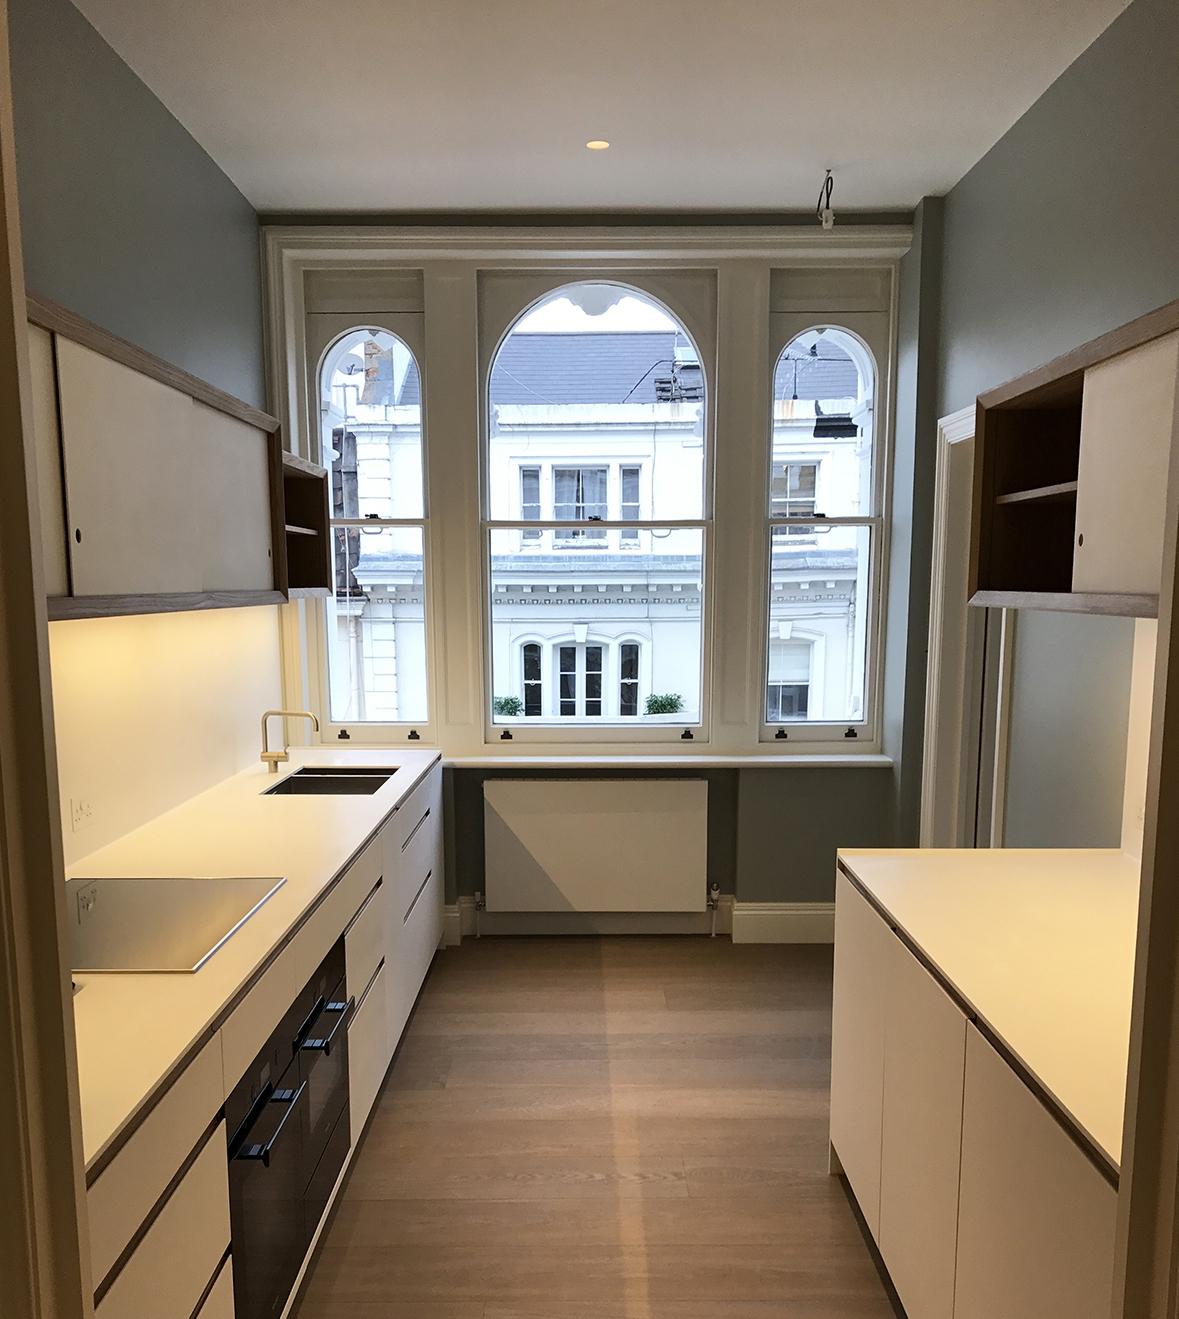 Cornwal House Kitchen - Copy.JPG